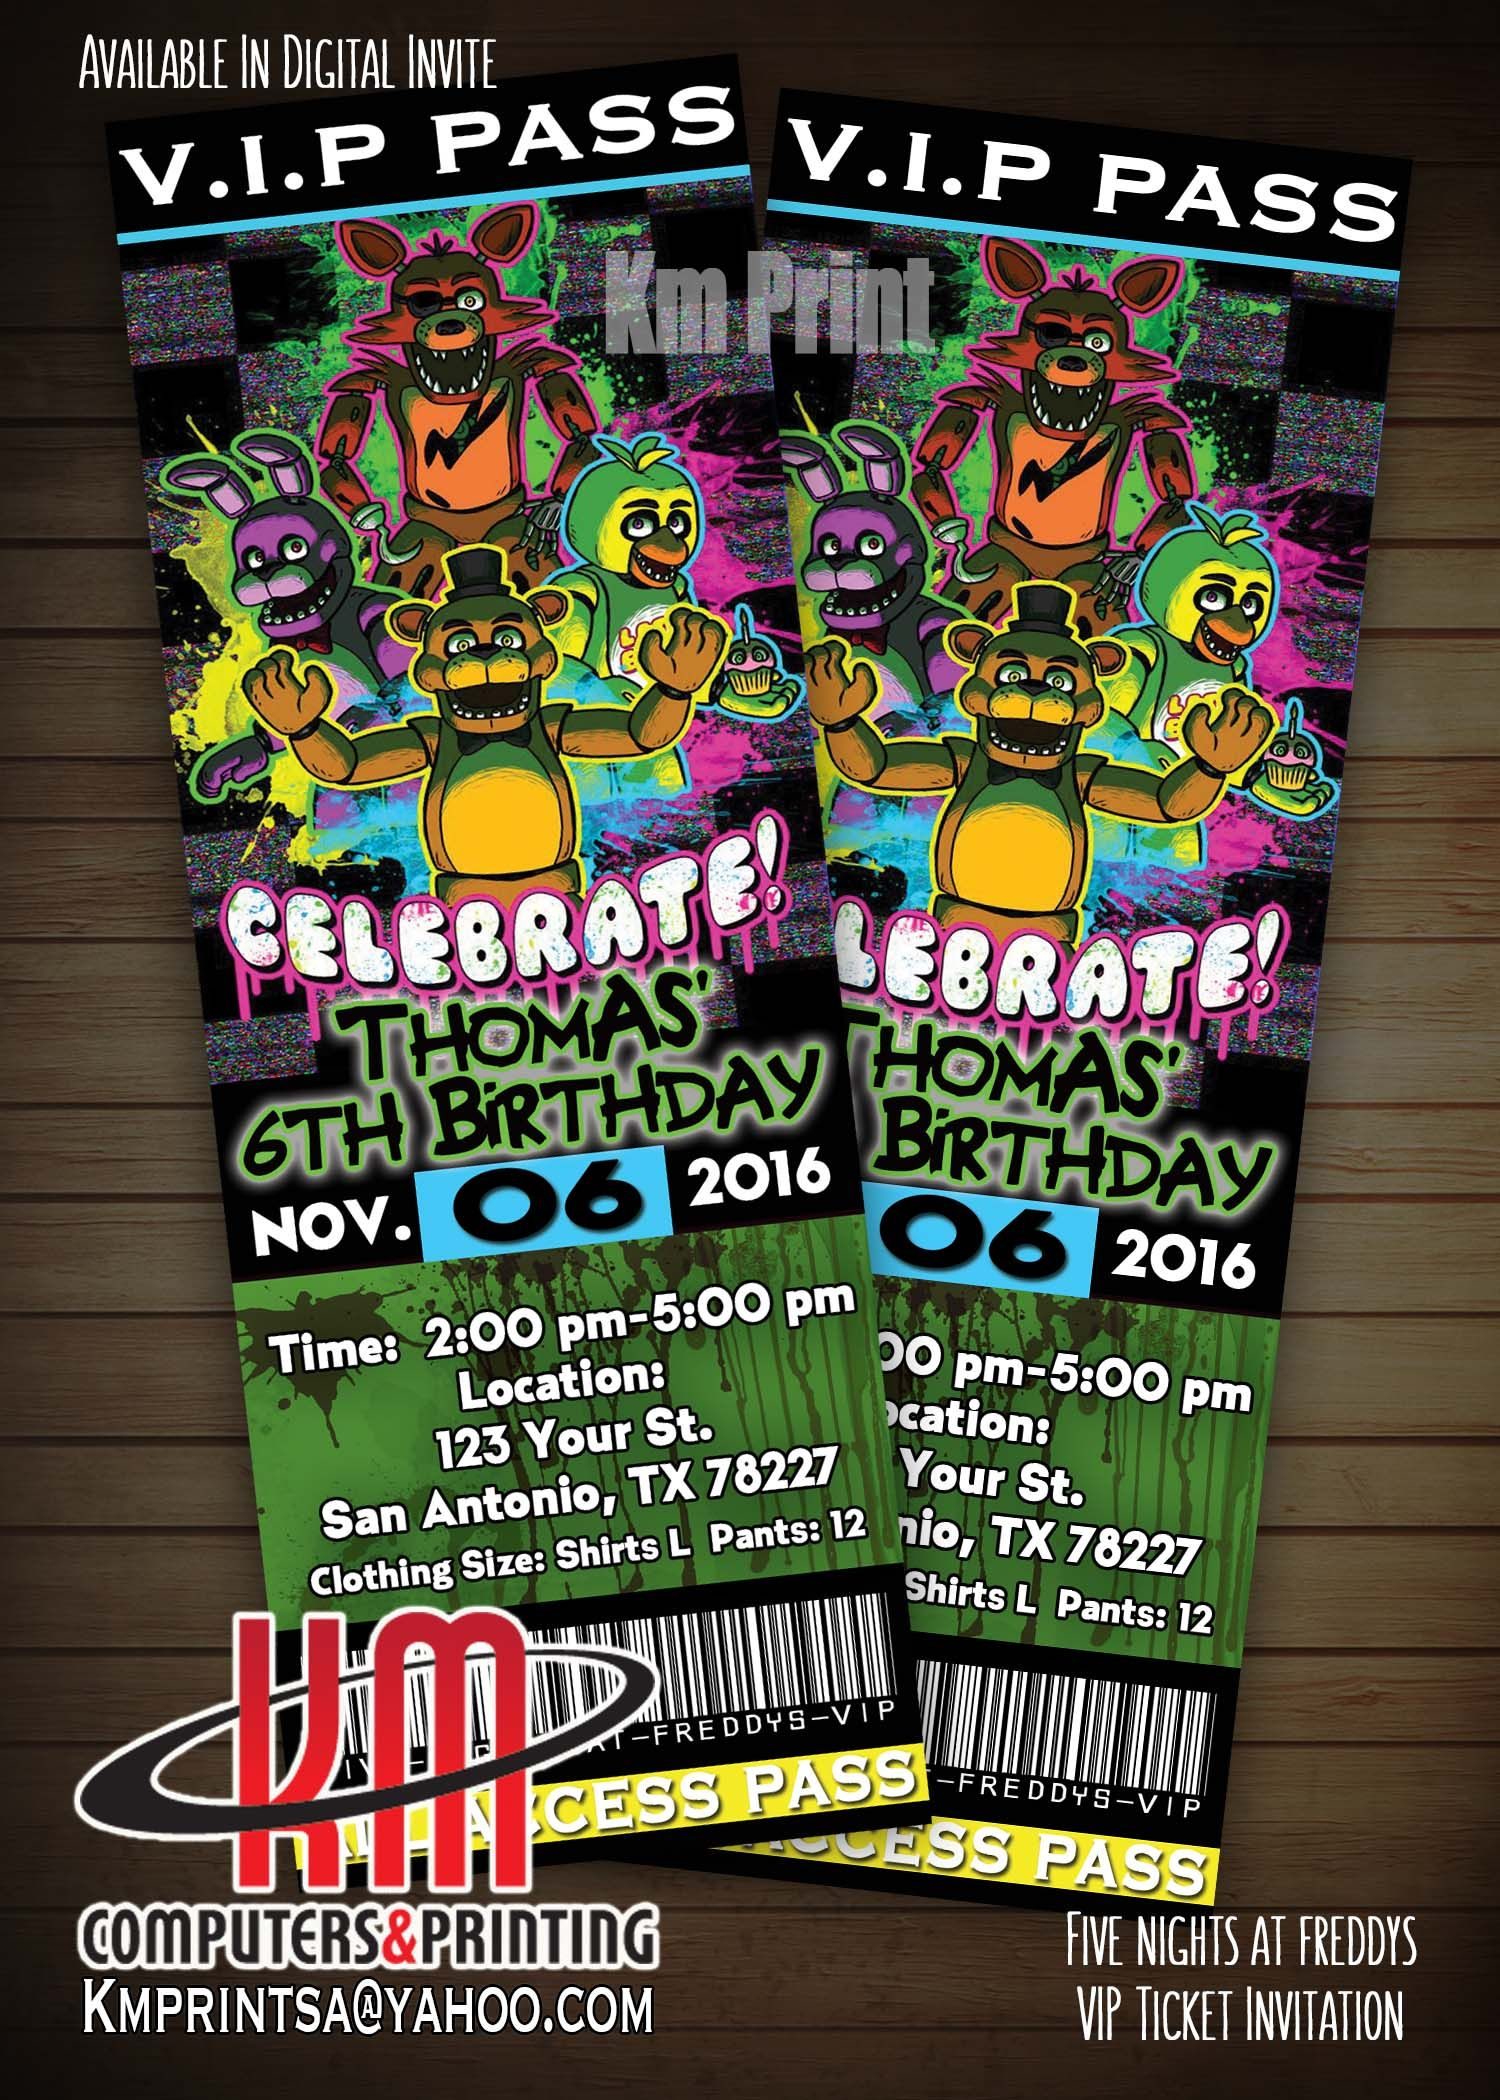 5 Nights At Freddys Party Invitation VIP Ticket 25 For Or Digital U Print 10 Kmprintsayahoo